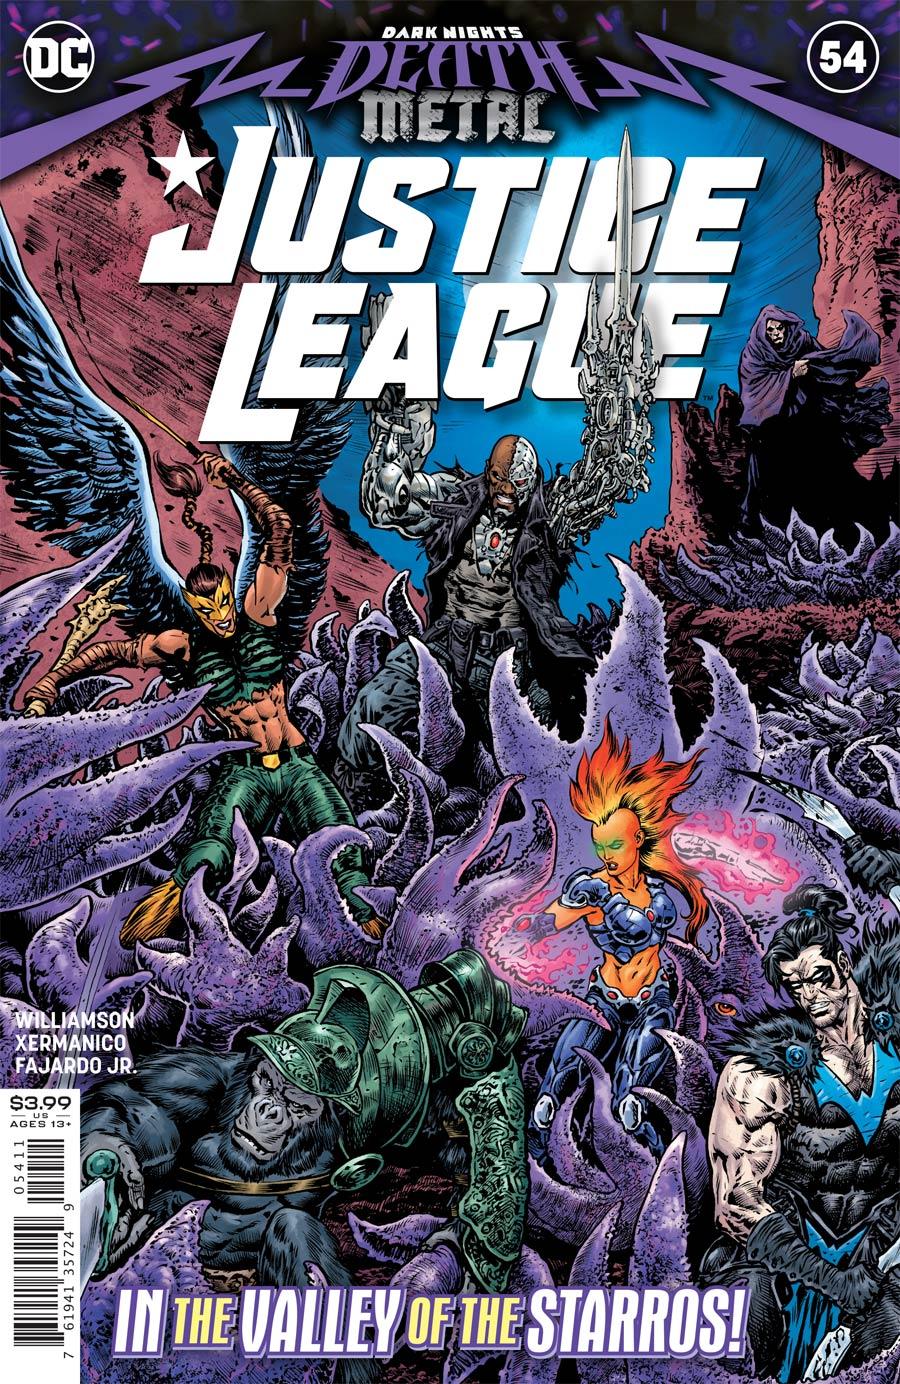 Justice League Vol 4 #54 Cover A Regular Liam Sharp Cover (Dark Nights Death Metal Tie-In)